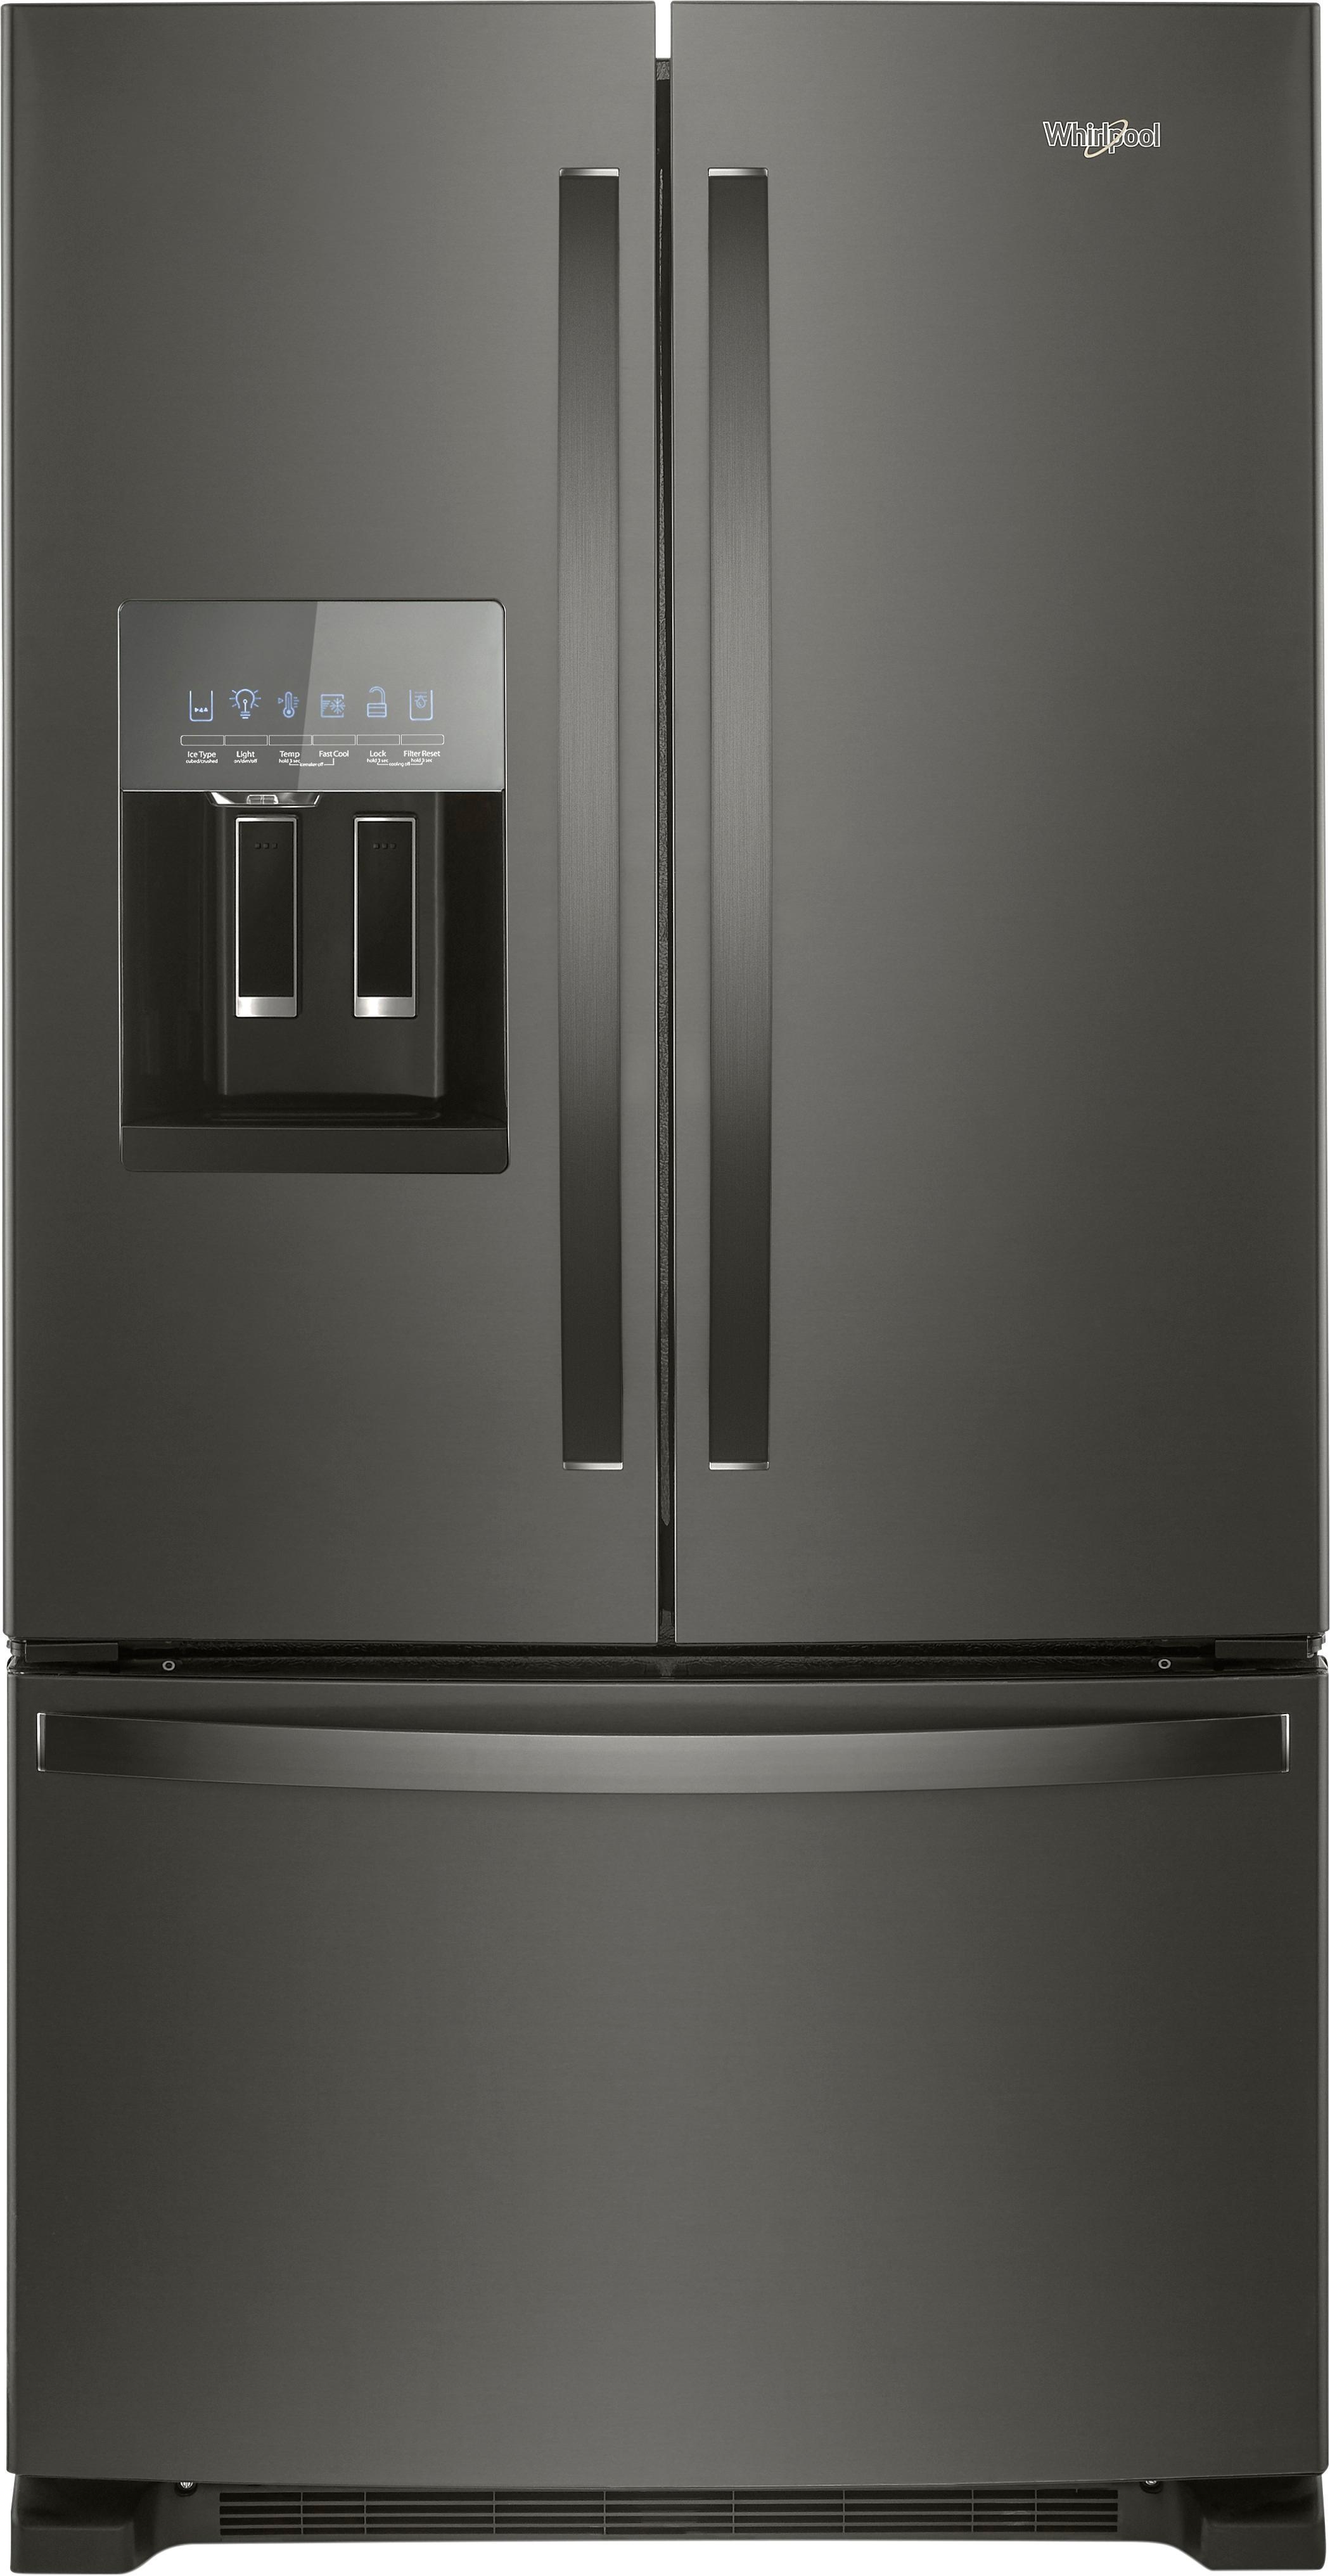 ft french door refrigerator gray wrf555sdhv best buy